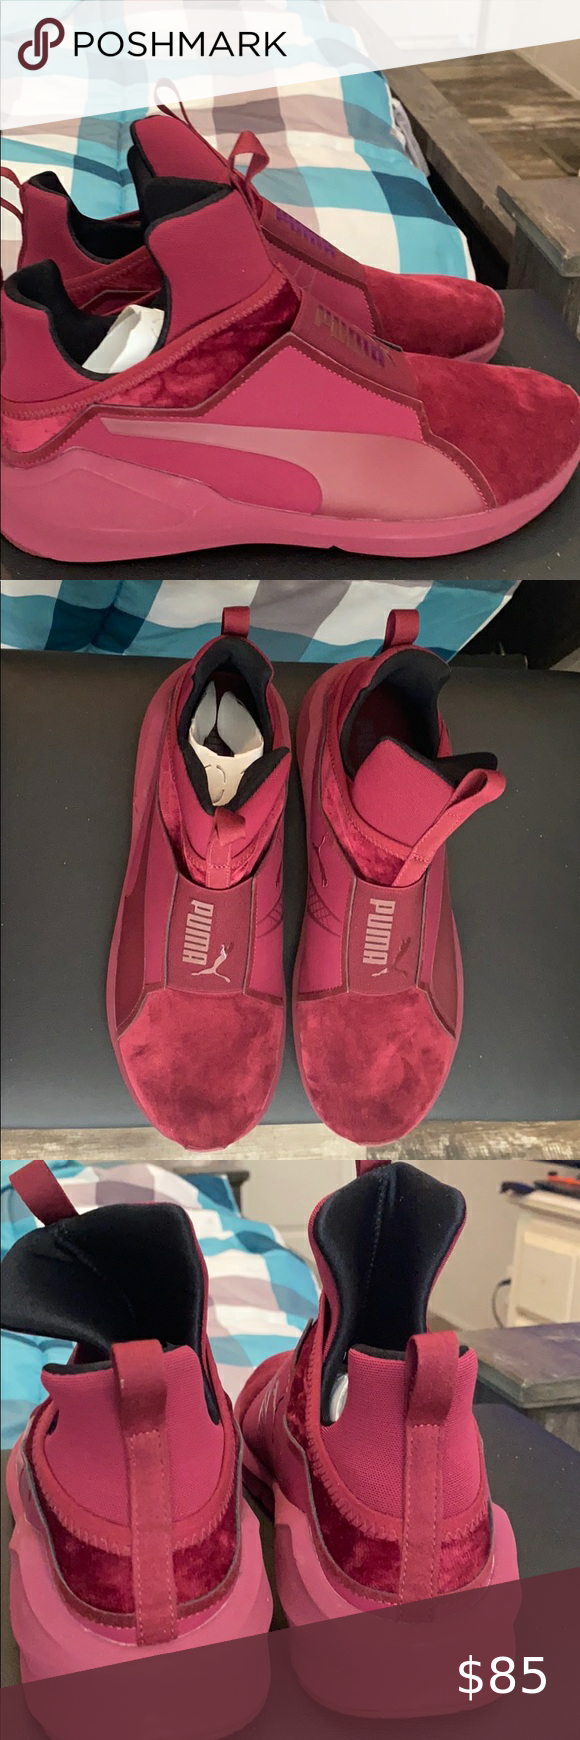 Puma, Womens shoes sneakers, Puma fierce